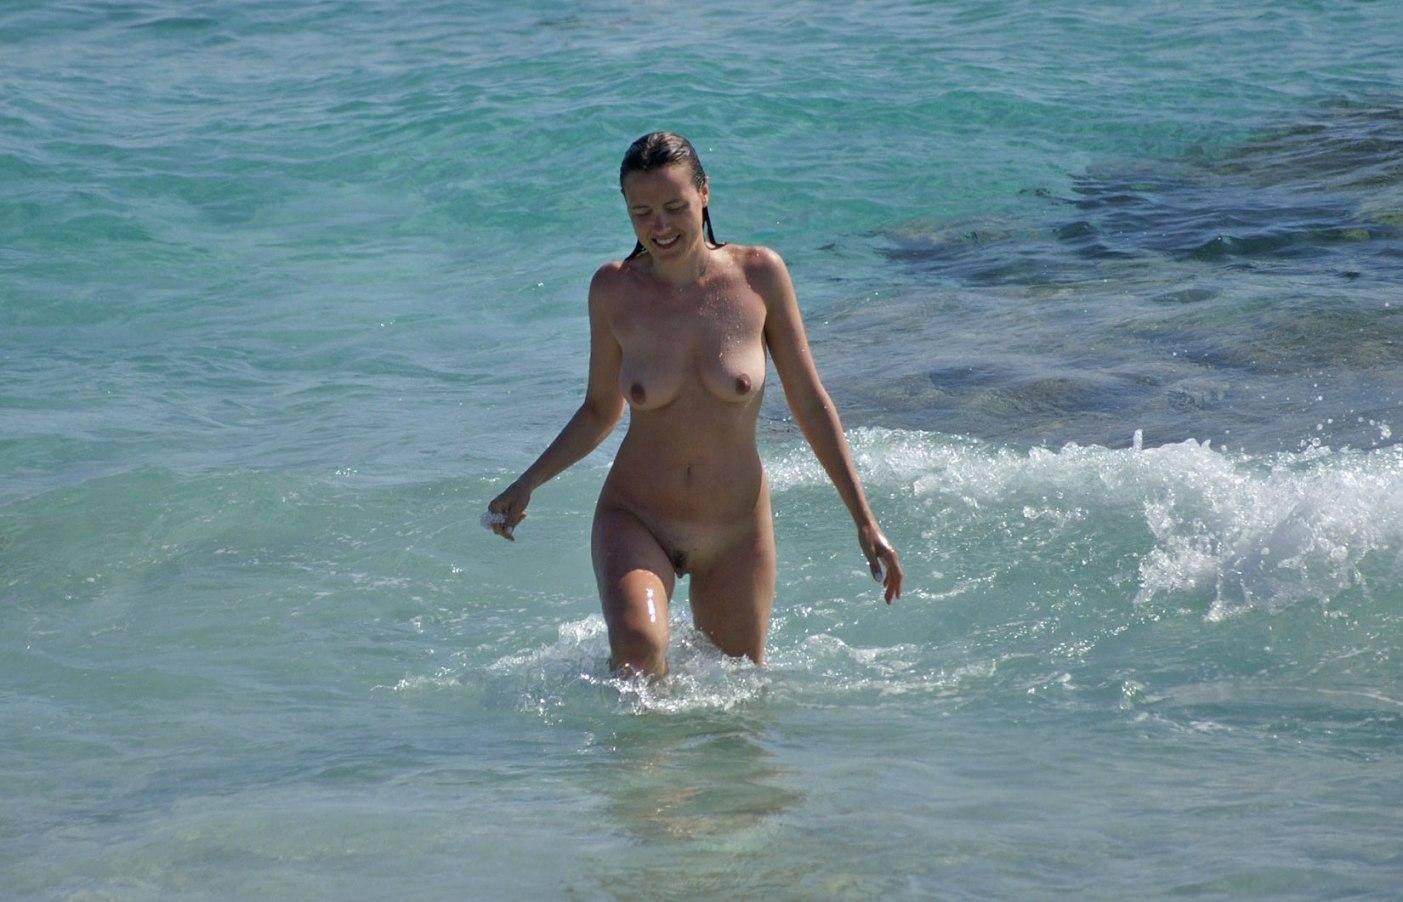 www.nudismlife.com   4 http://www.nudismlife.com /galleries/nudists_and_nude/nudists_various/Nudists_nude_naturists_tumblr_103.jpg